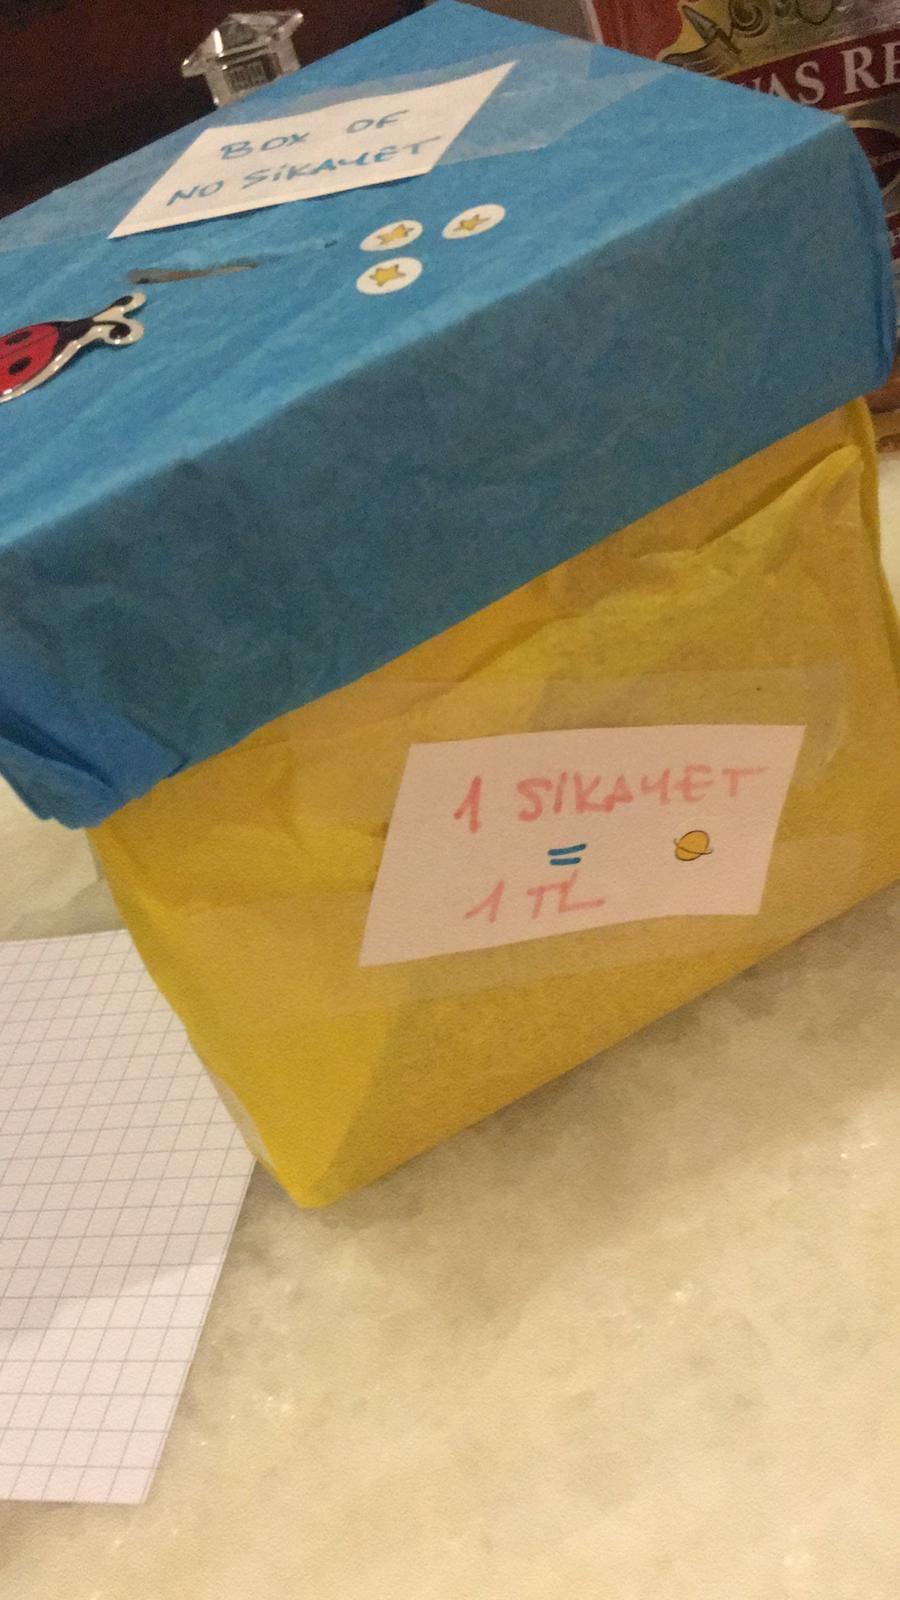 Box of no şikâyet